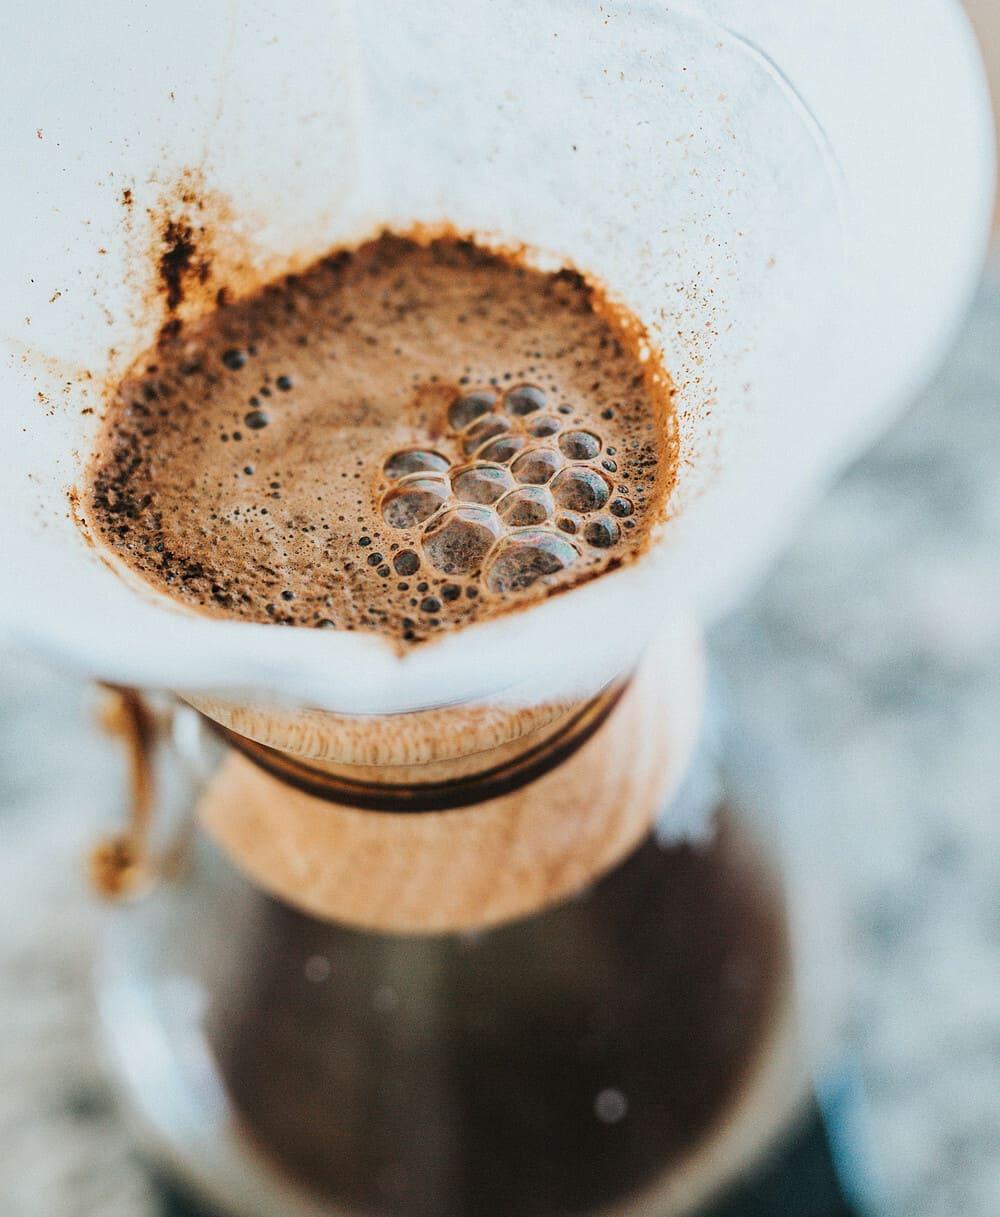 cách ủ cafe ngon ra sao